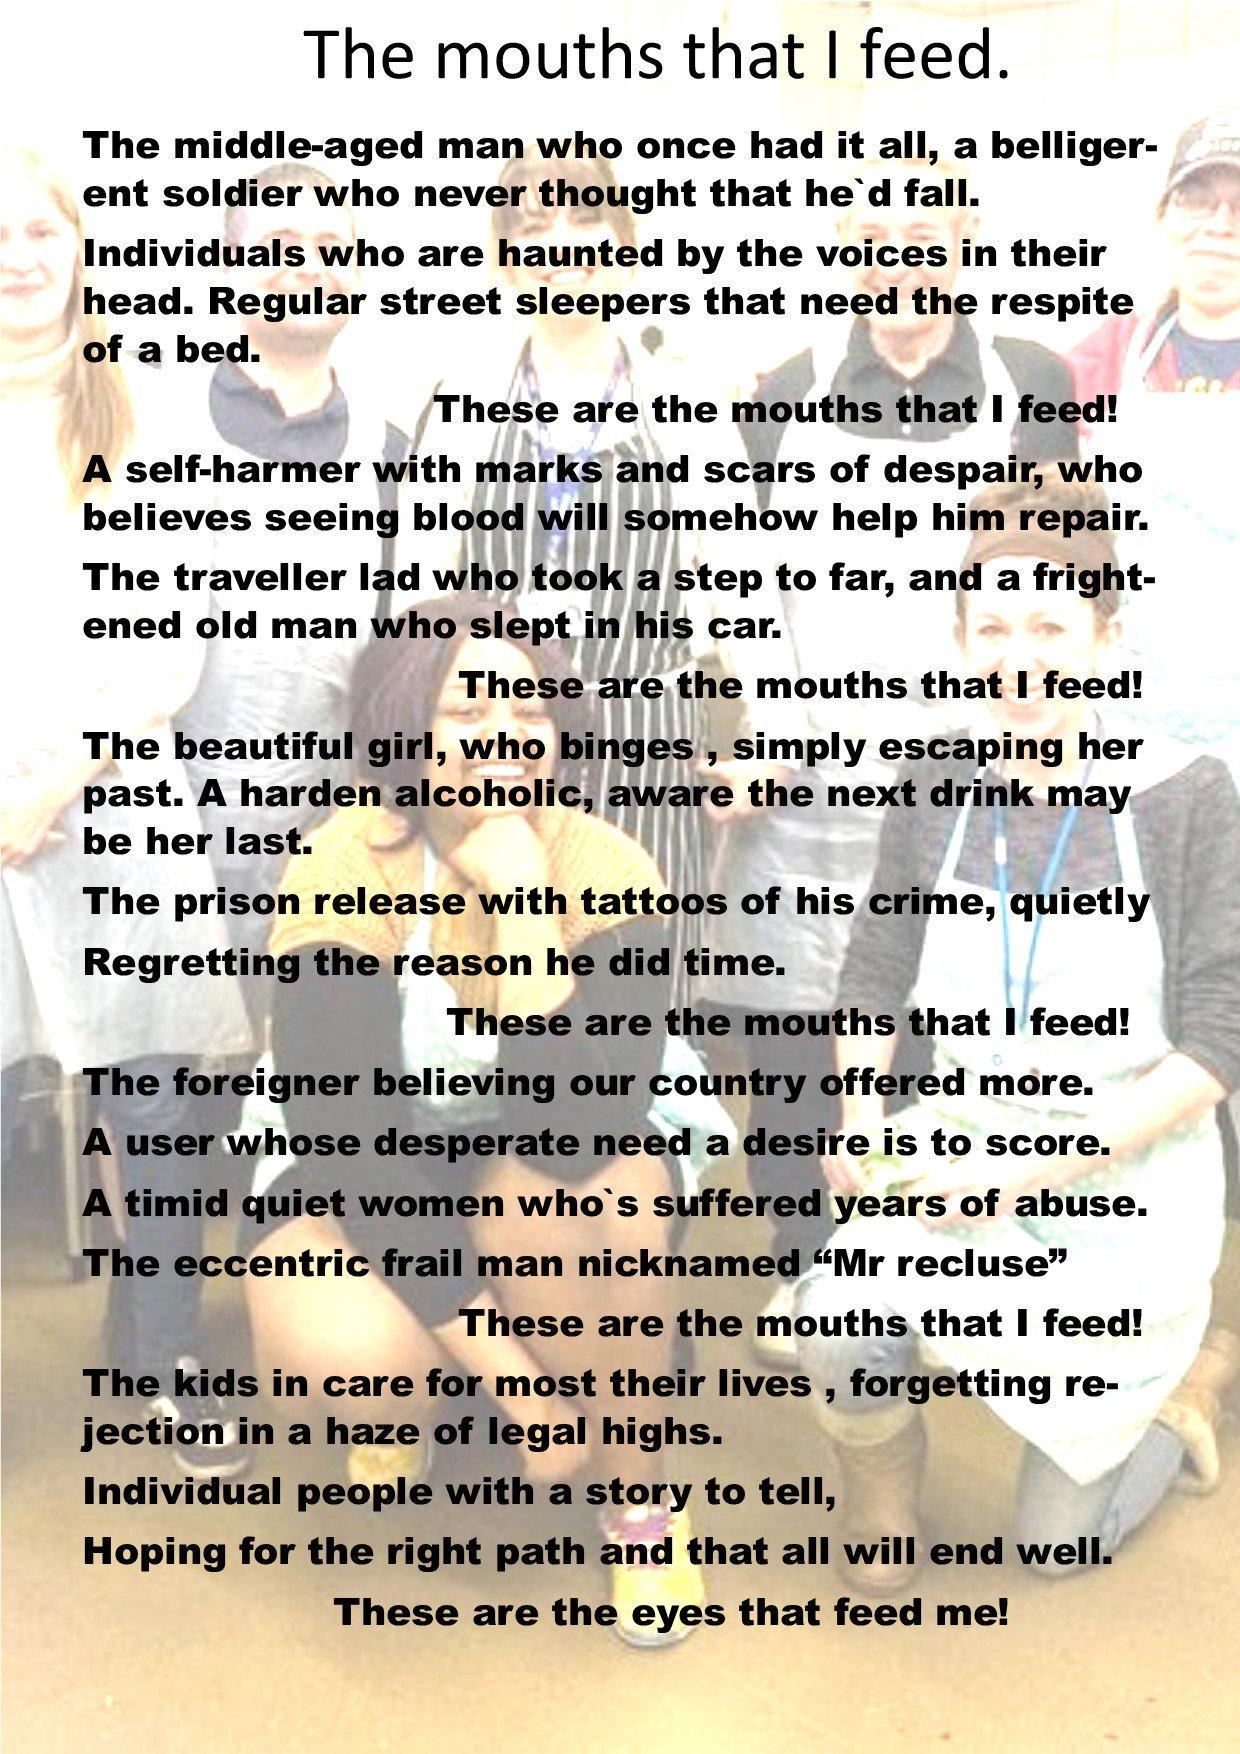 Mel has written a poem about her work with YRP #24hoursatYRP #Woking #Homeless #heartbreaking https://t.co/CNU4NnxYiA